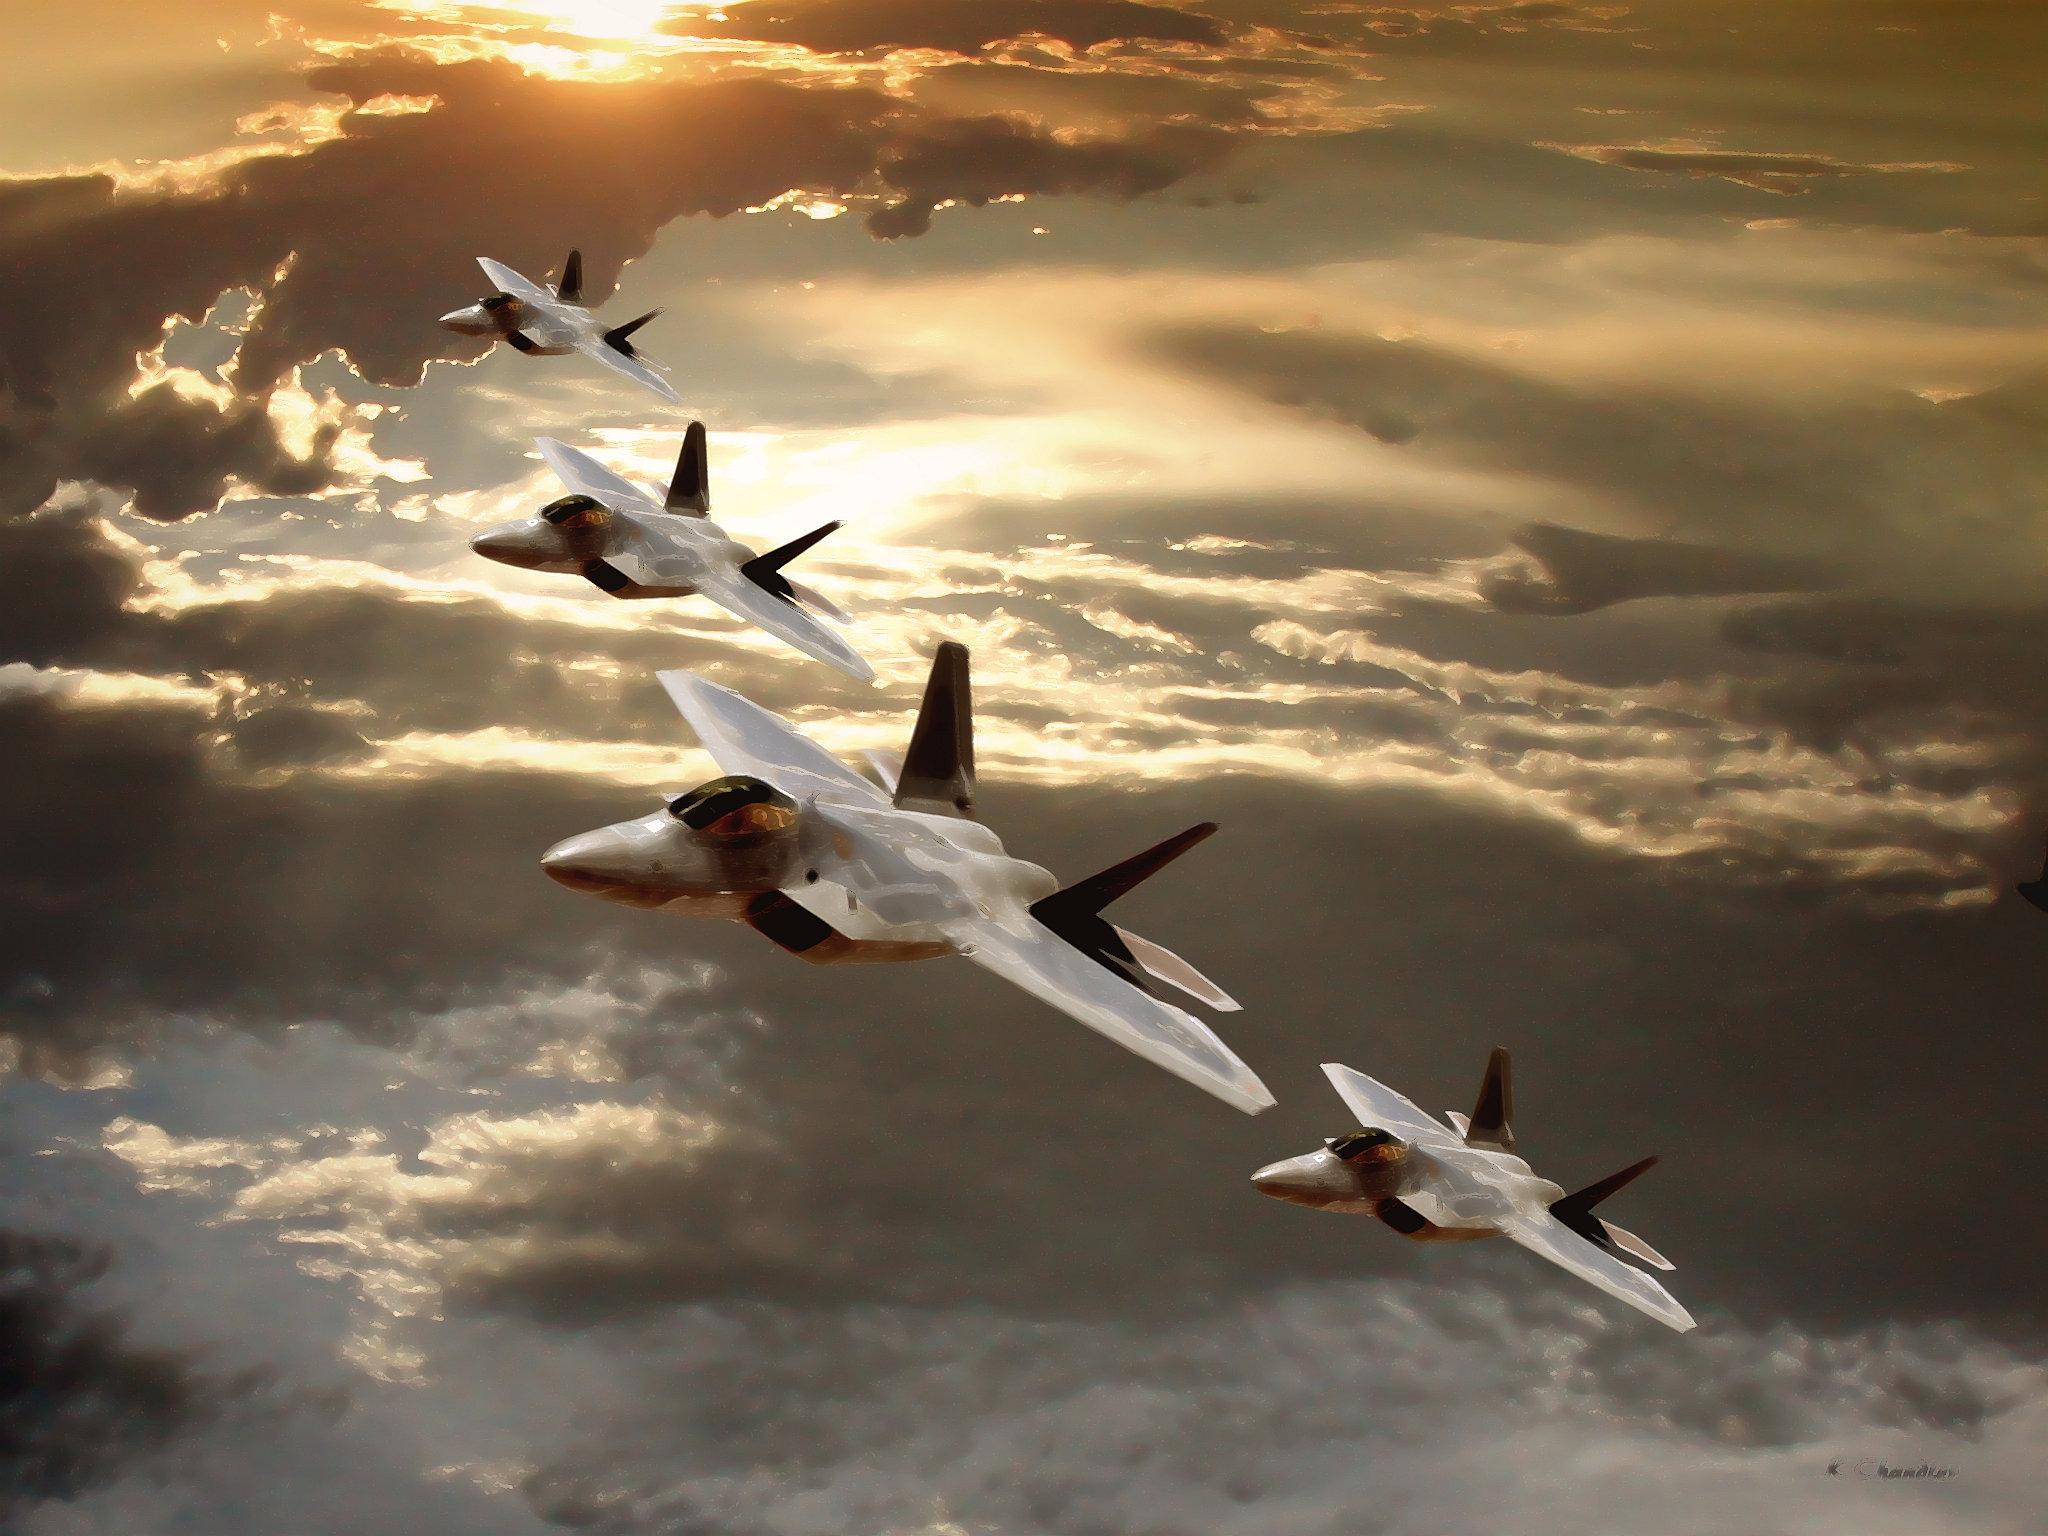 Four gray F 22 Raptor combat jet planes in formation flight in golden 2048x1536